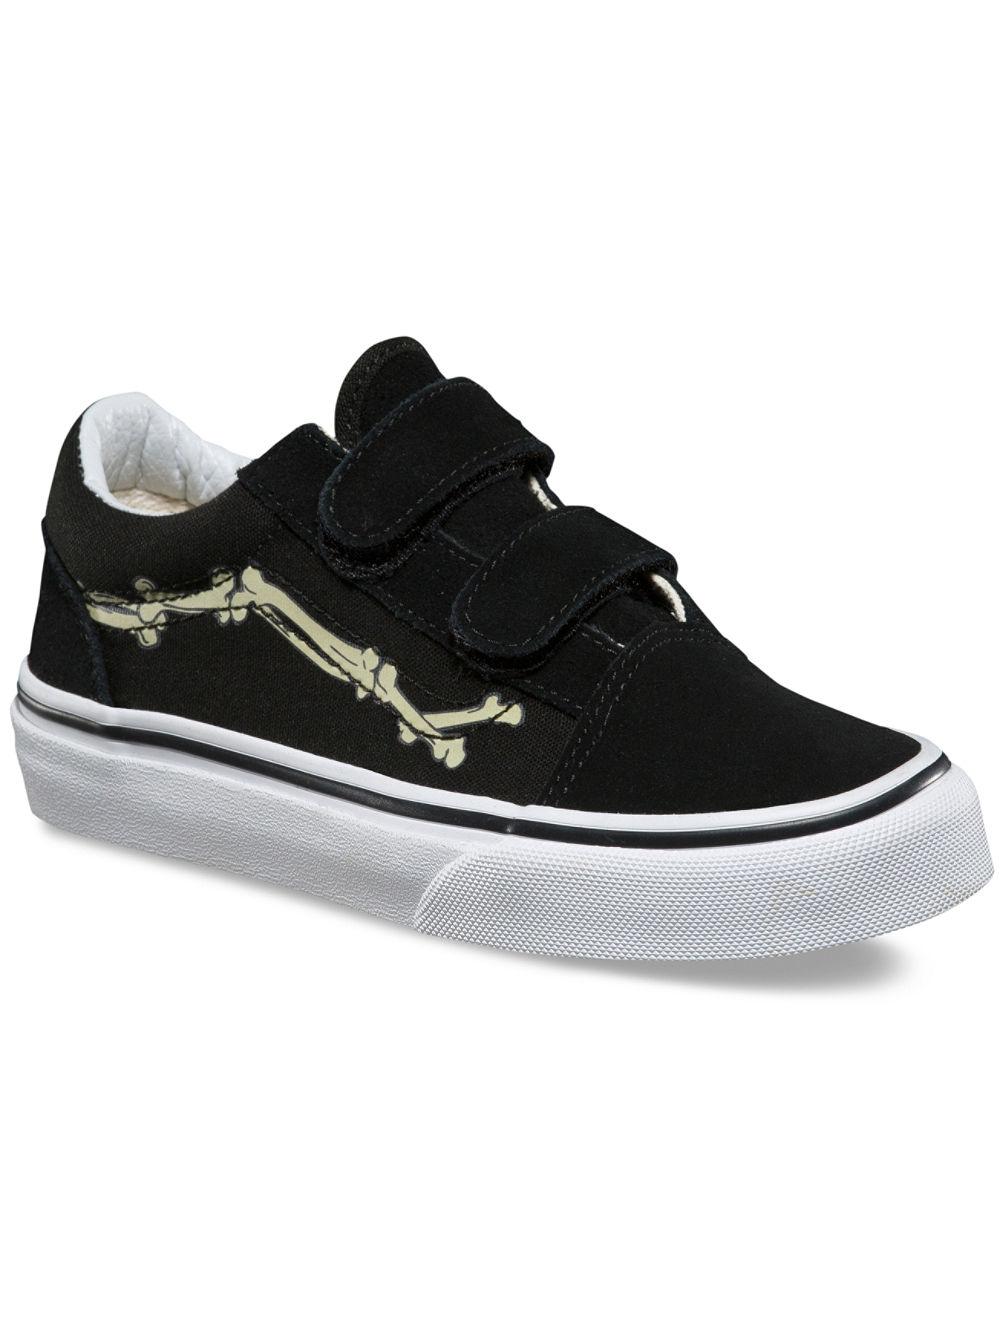 56824904c49 Buy Vans Old Skool V Sneakers Boys online at blue-tomato.com